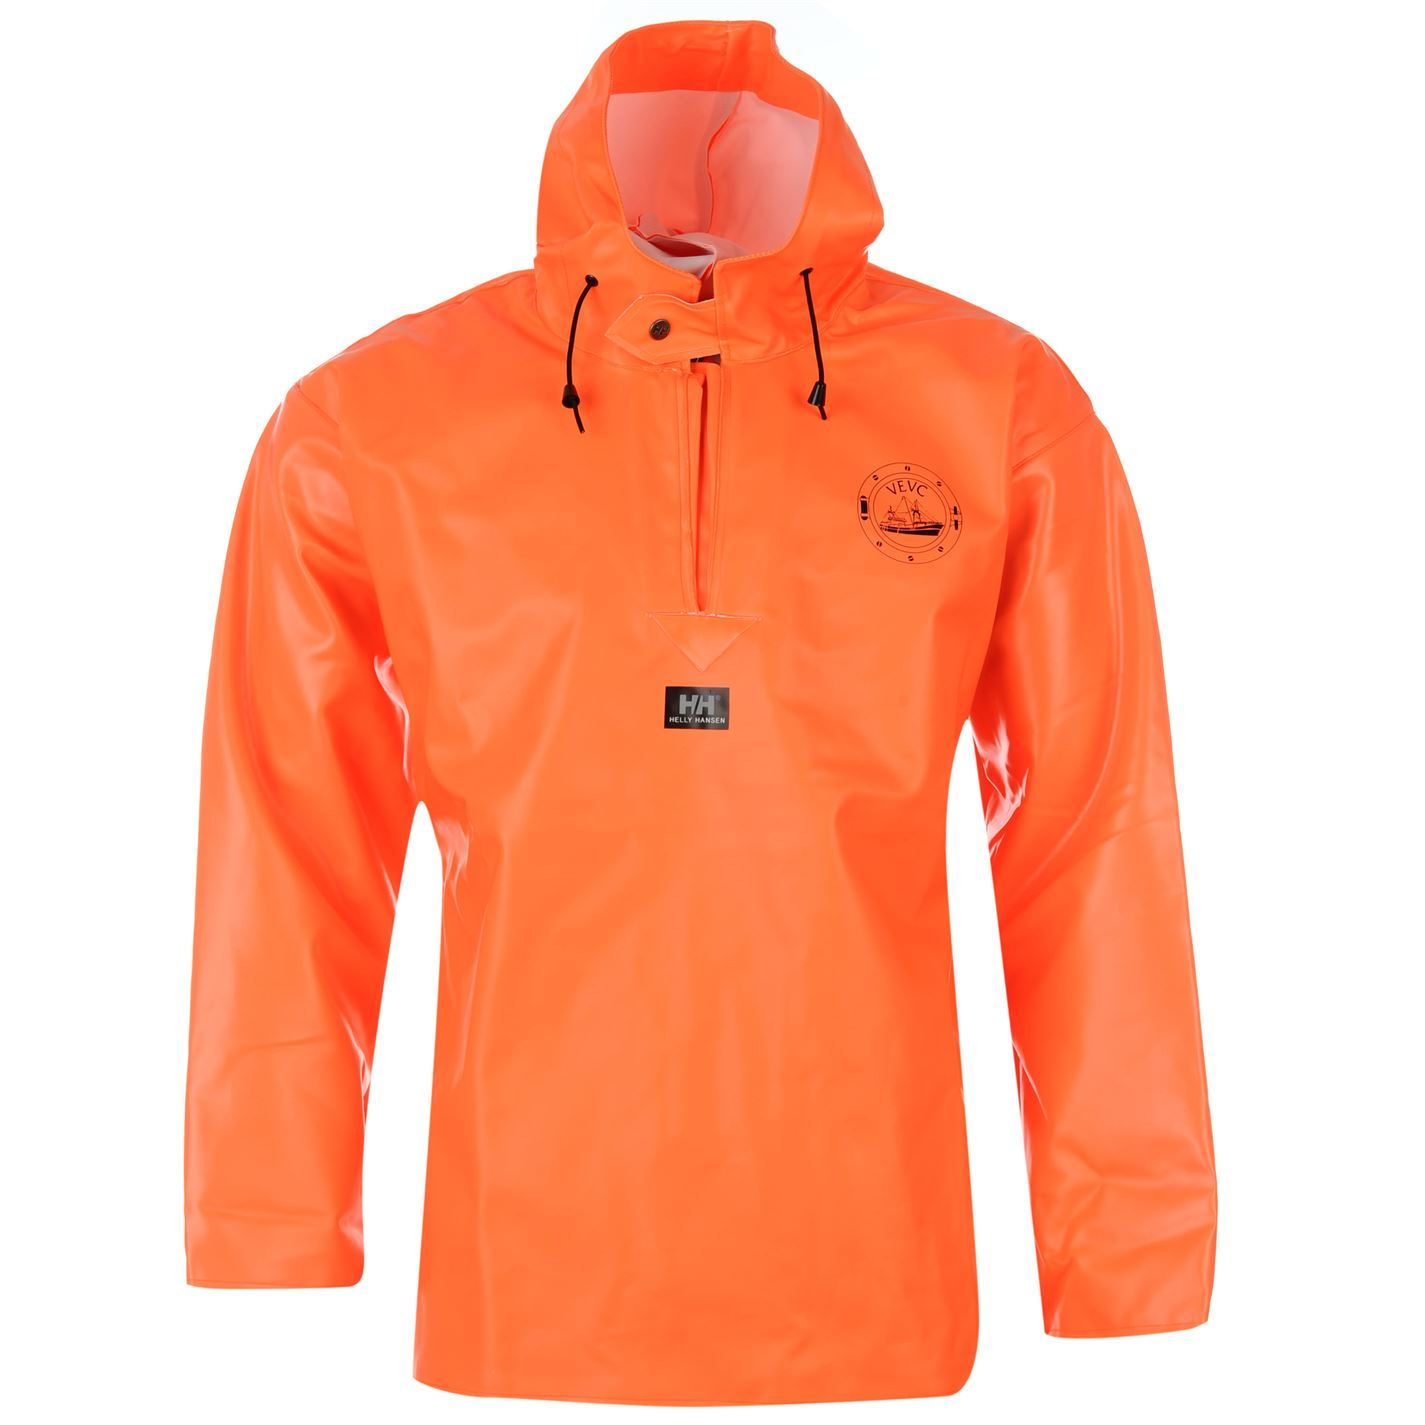 Helly Hansen Mens Rain Jacket Waterproof Hooded Coat Outdoor | eBay